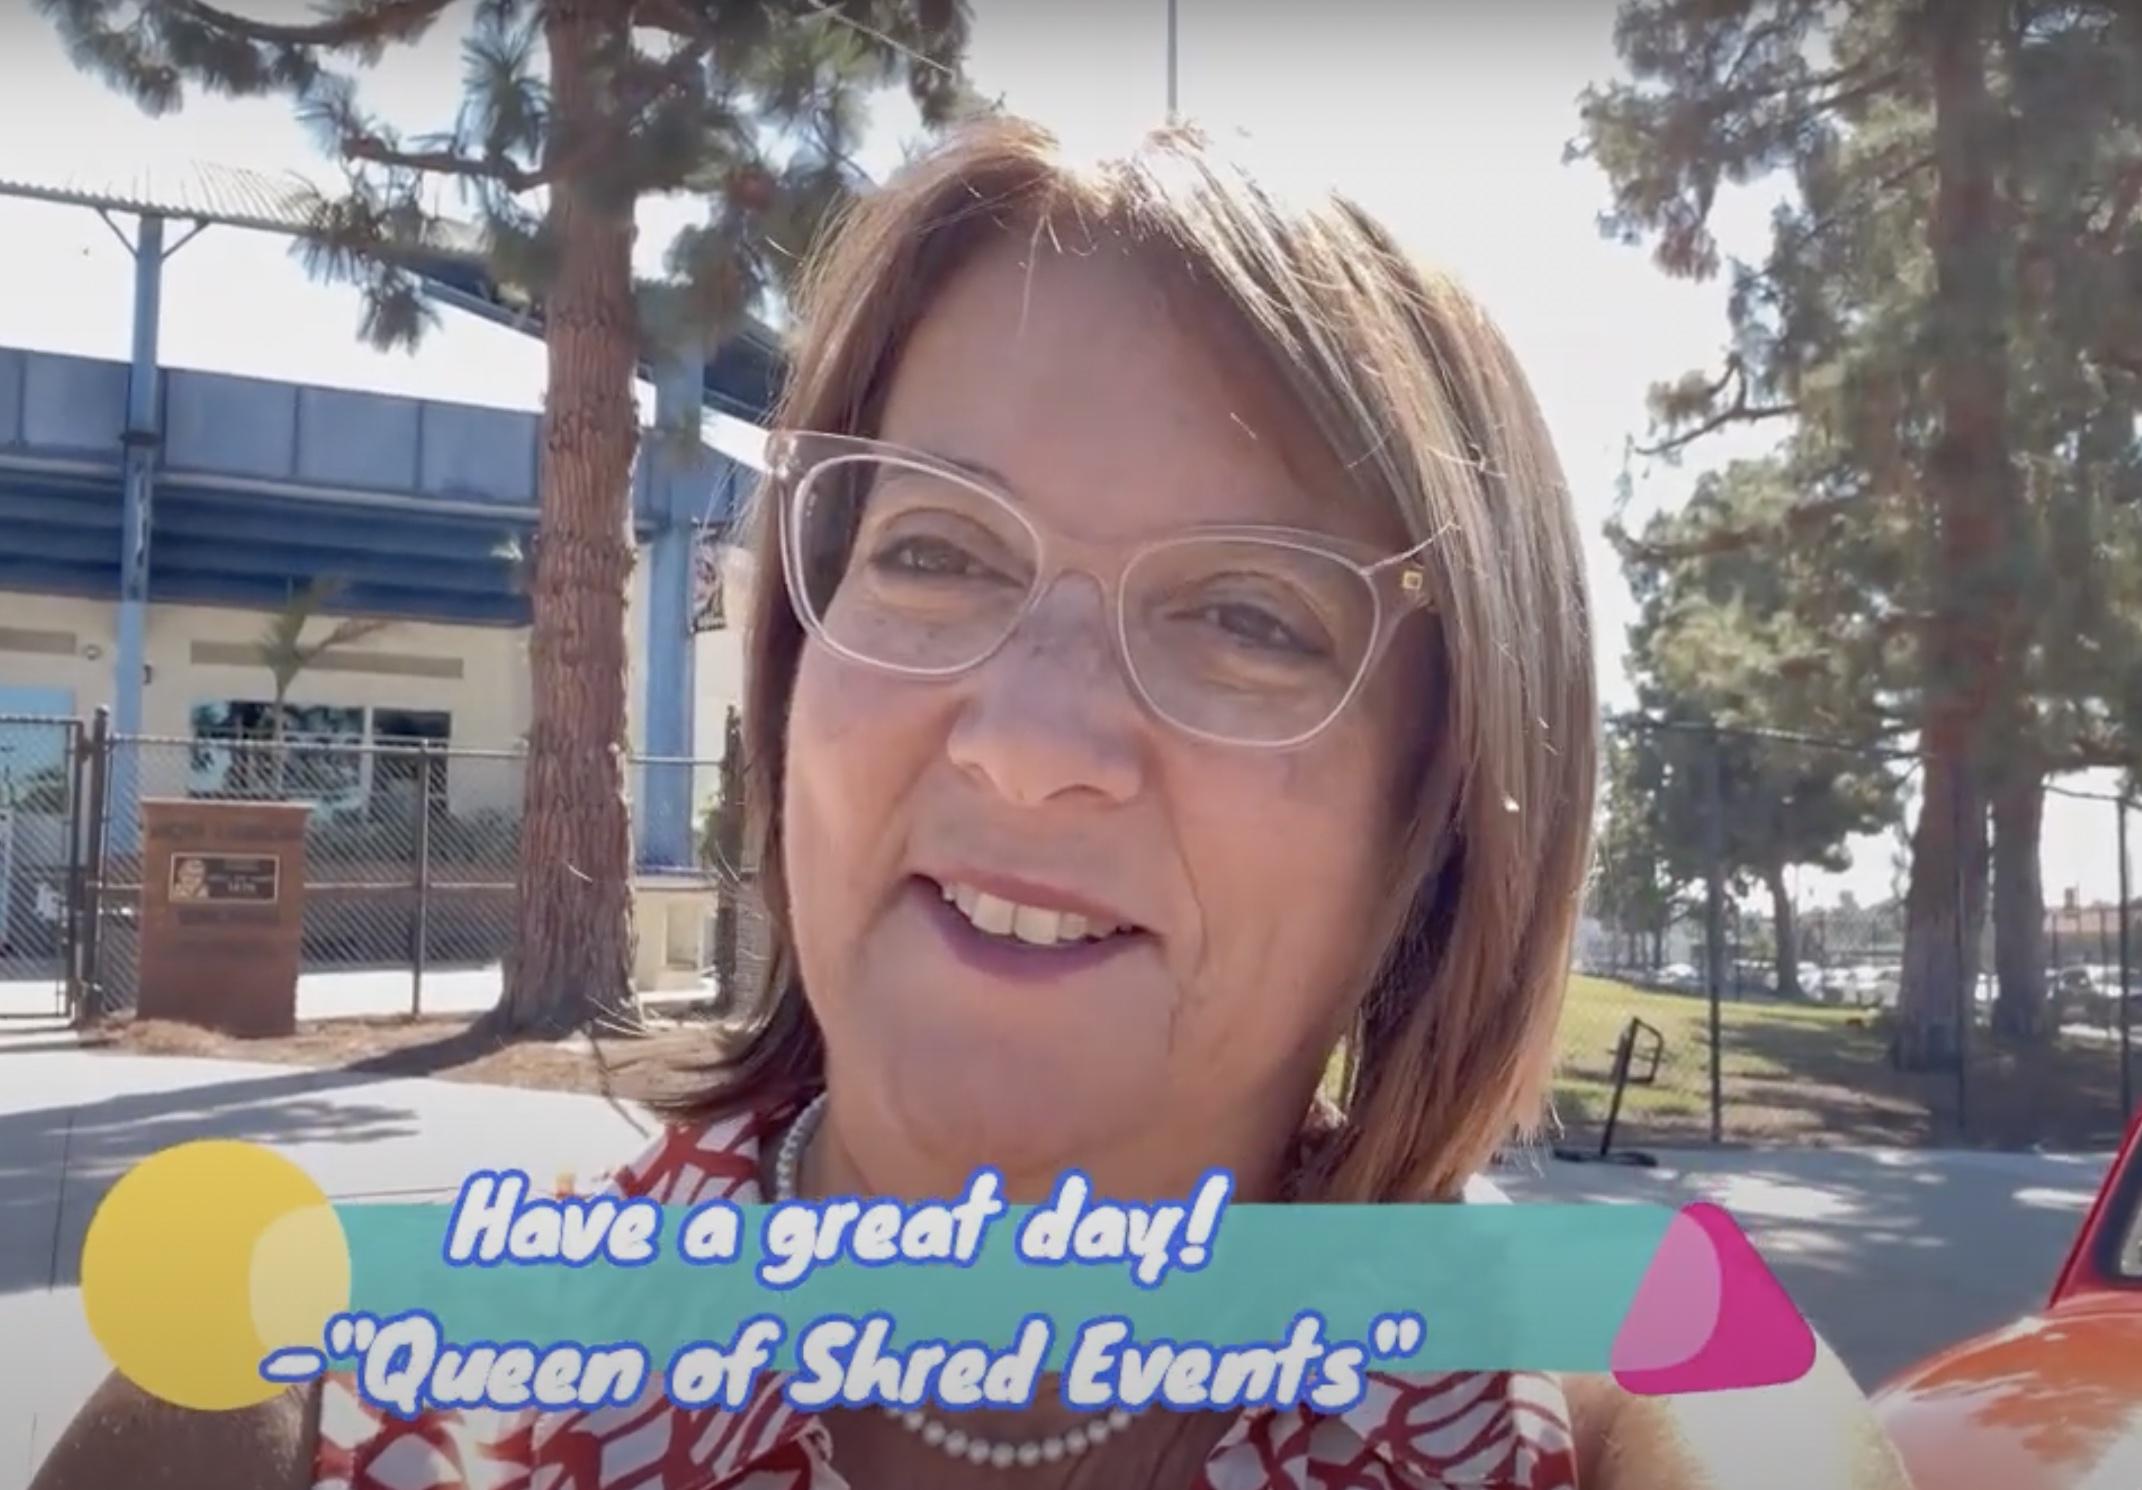 Free Document Shredding Events